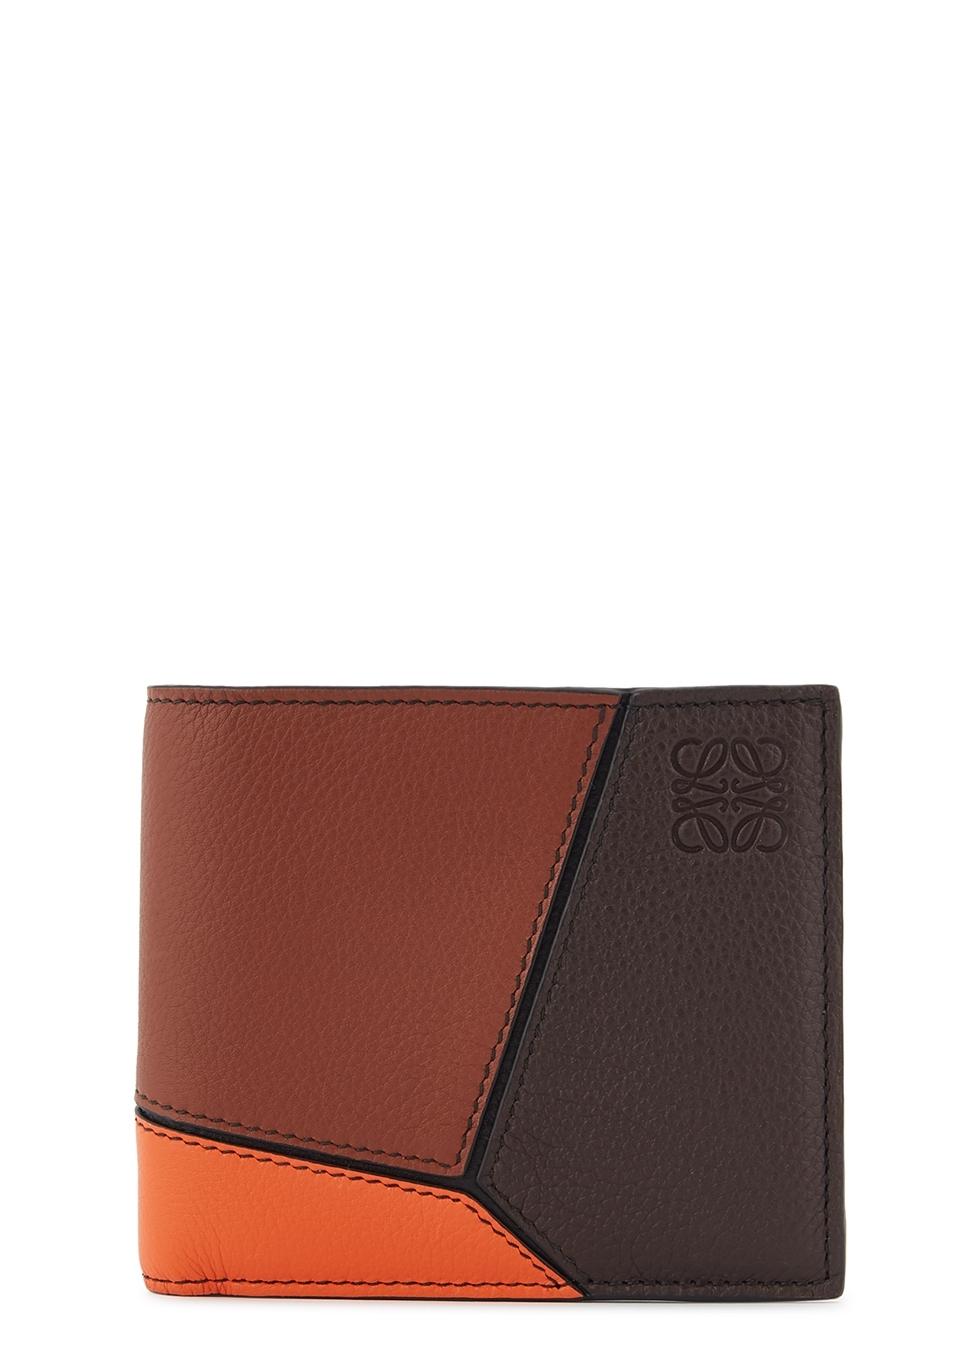 73919955d Men's Designer Small Leather Accessories - Harvey Nichols